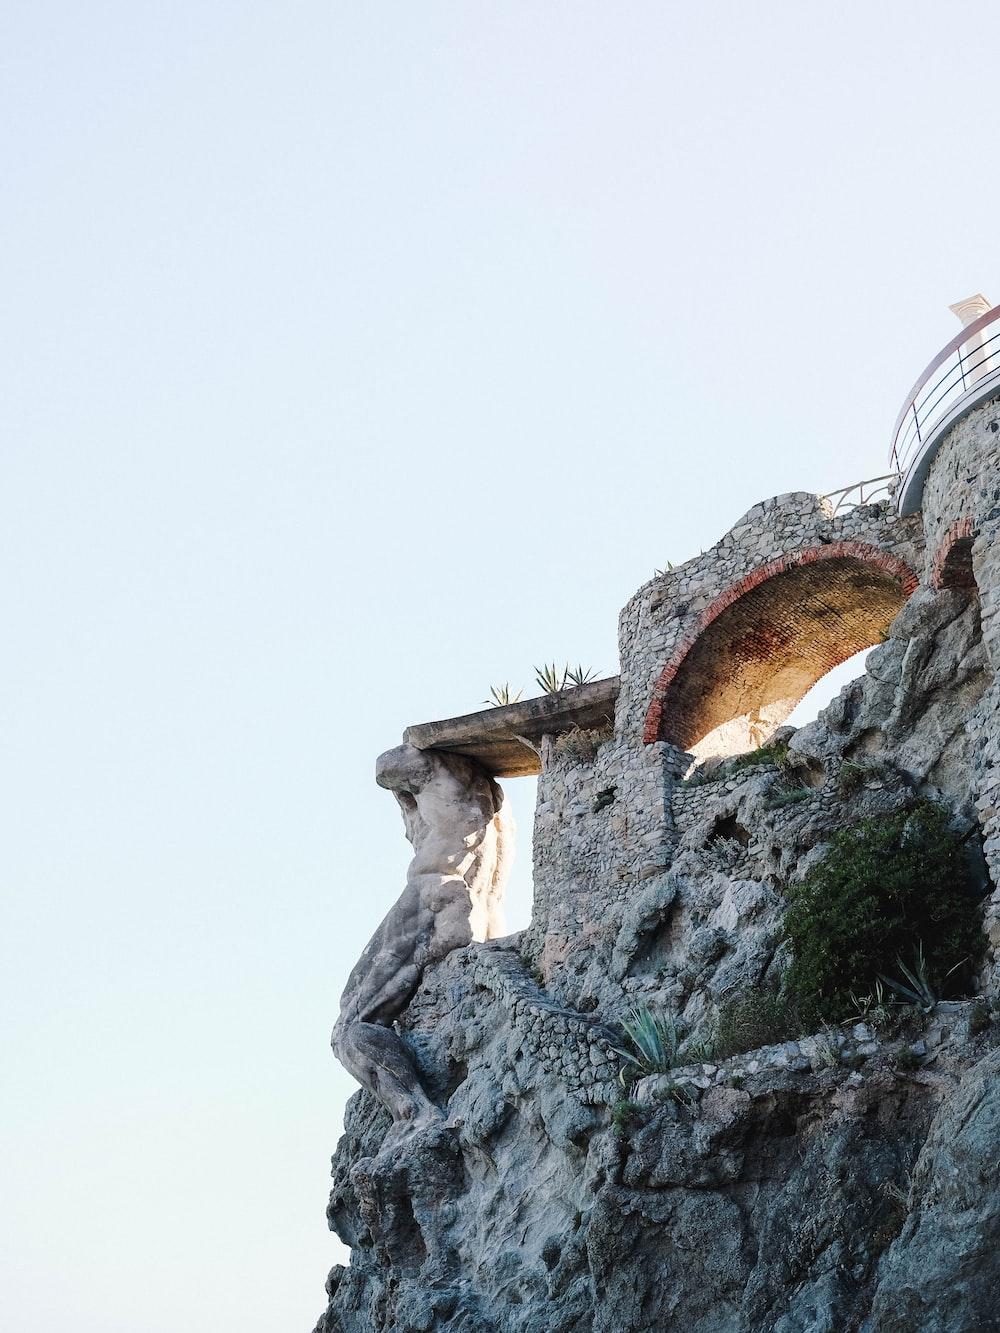 stone structure near cliff